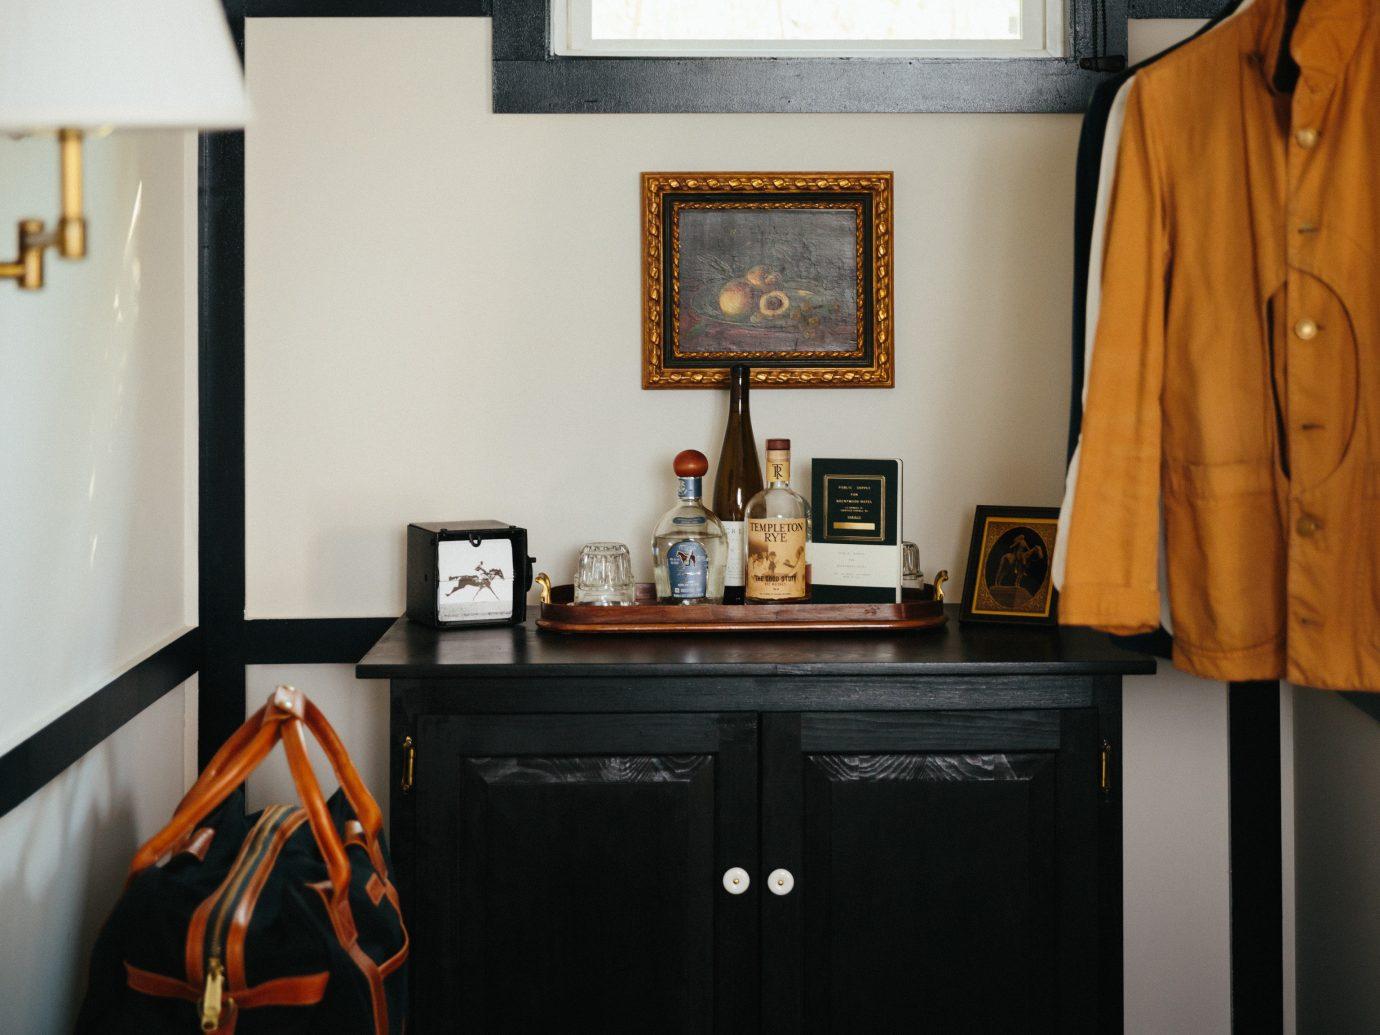 Hotels New York Romantic Hotels indoor wall room home interior design black Design furniture